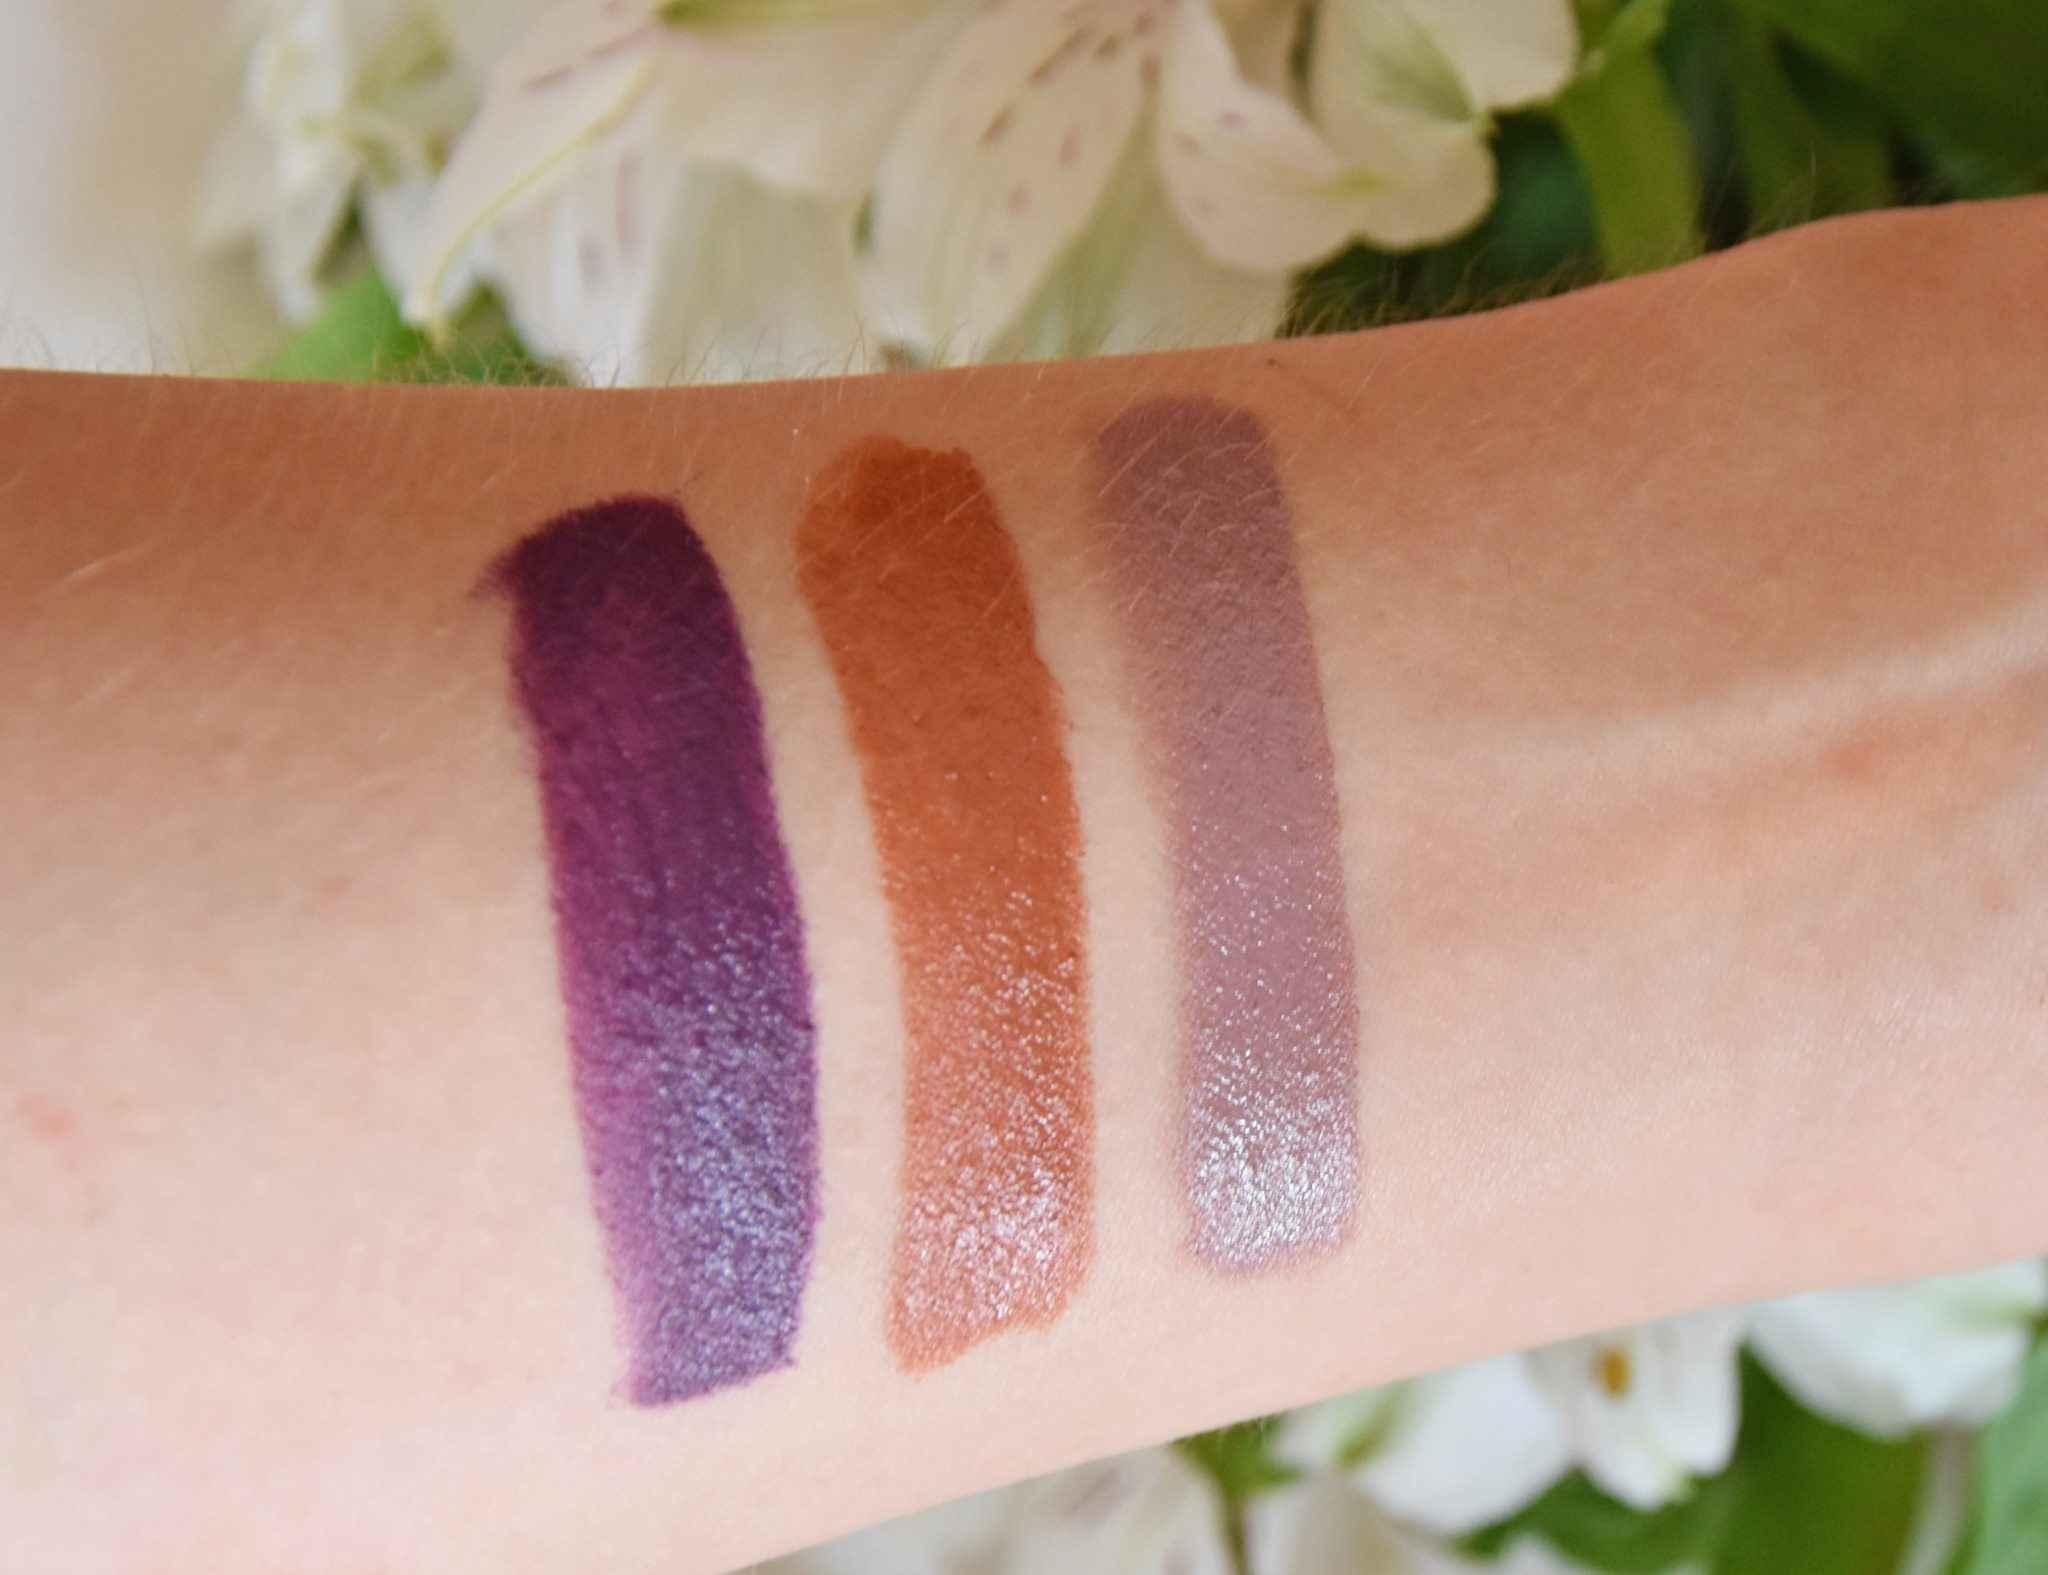 NARS Fall 2017 swatch lipsticks